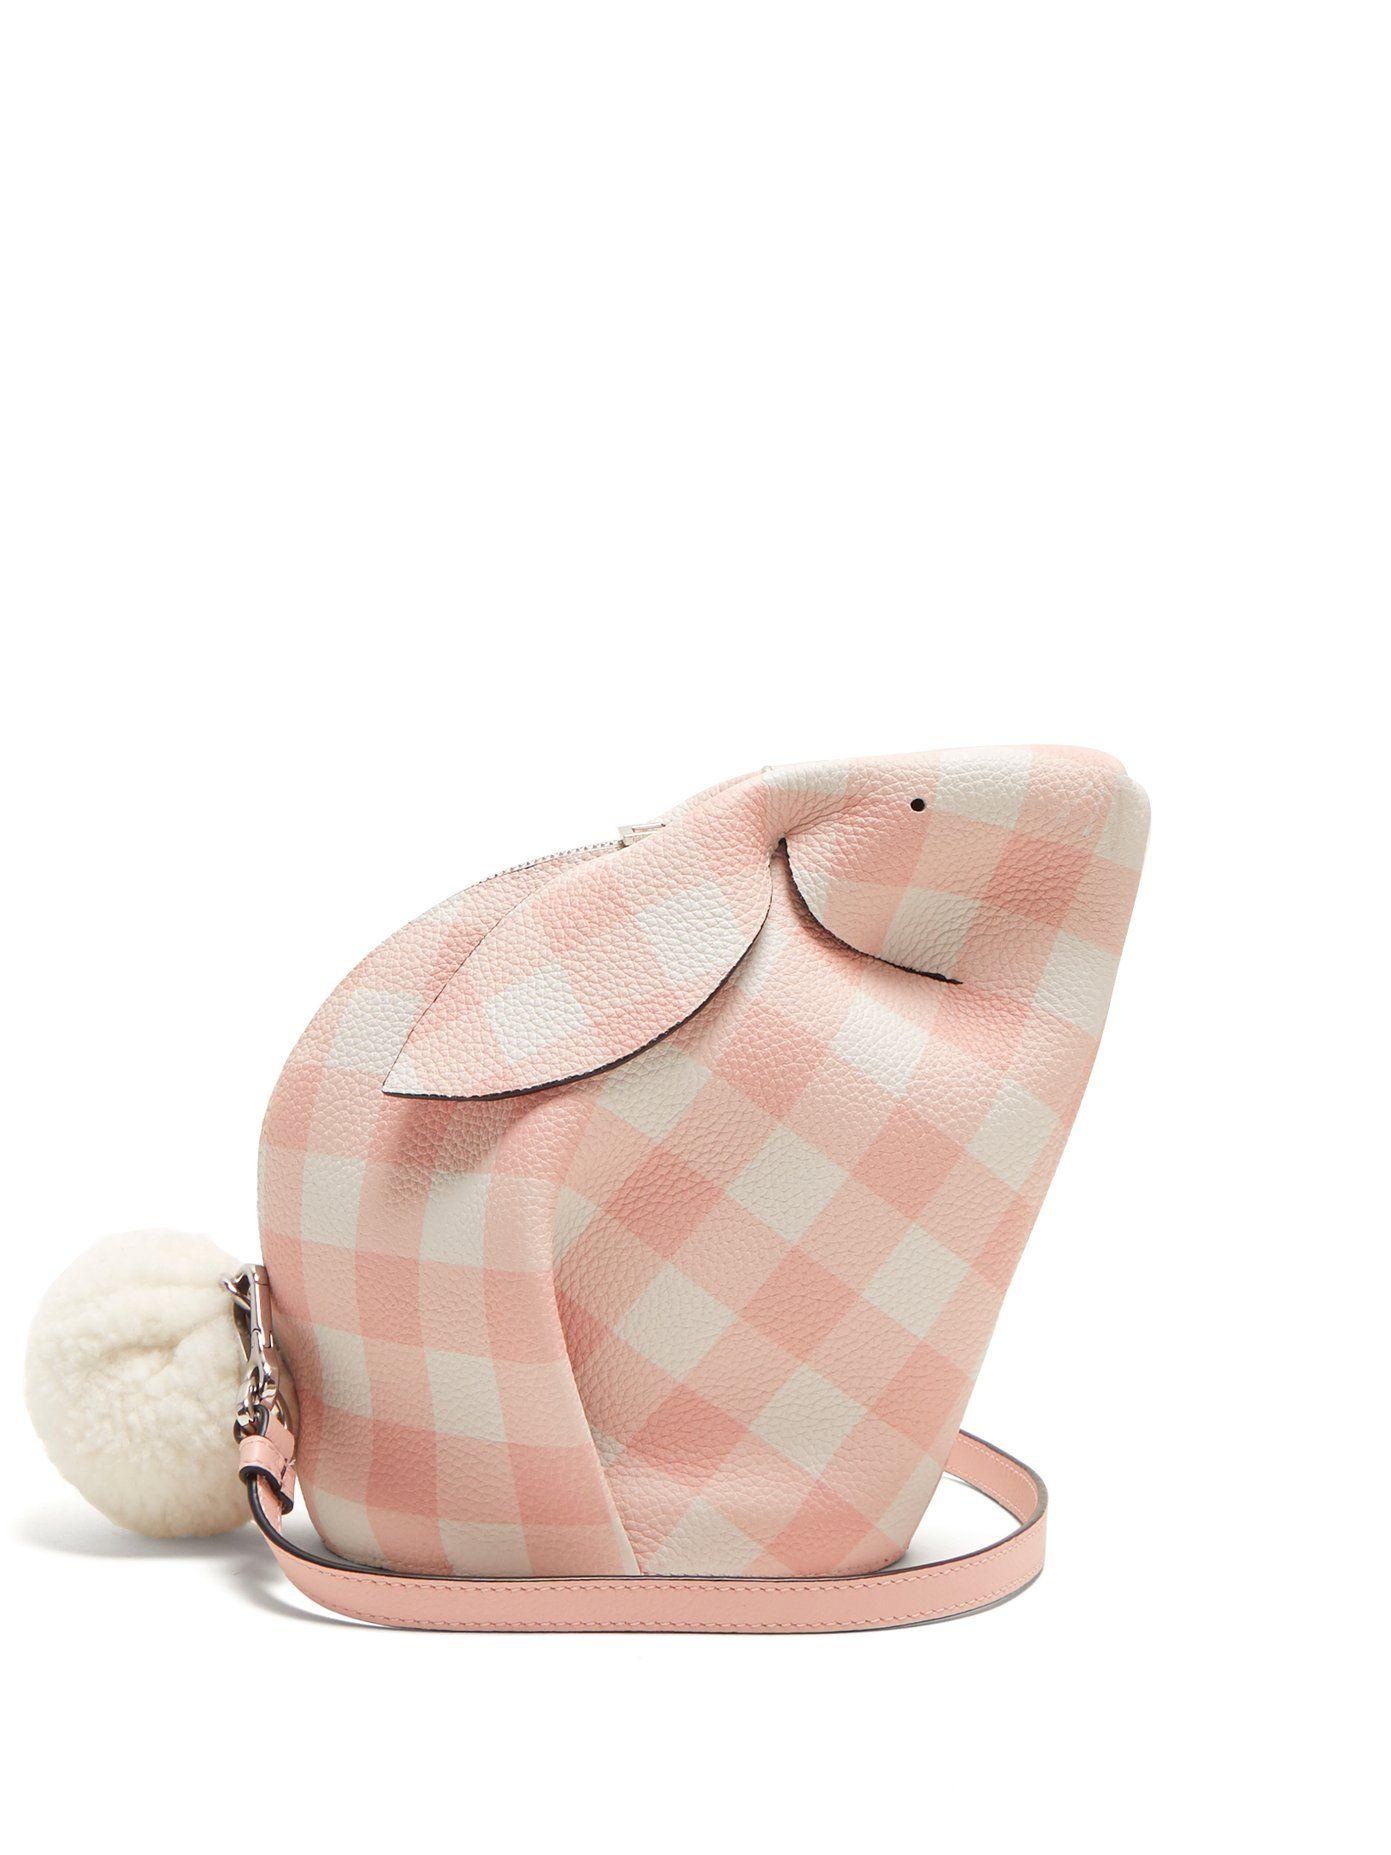 Bunny leather cross-body bag Loewe jSH2p